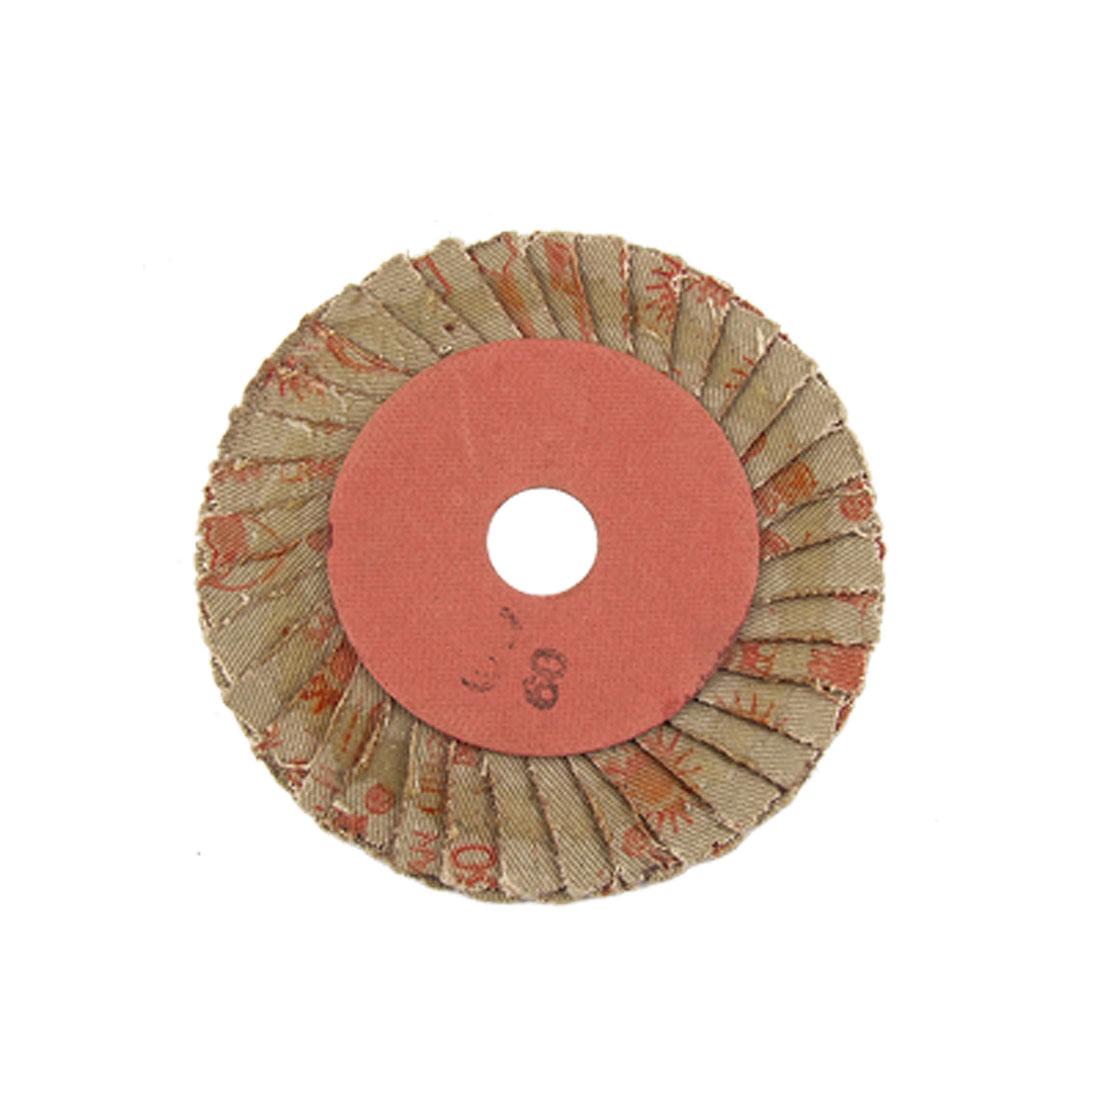 "60# Grit 4"" Outer Dia Flap Abrasive Wheel Sanding Disc"